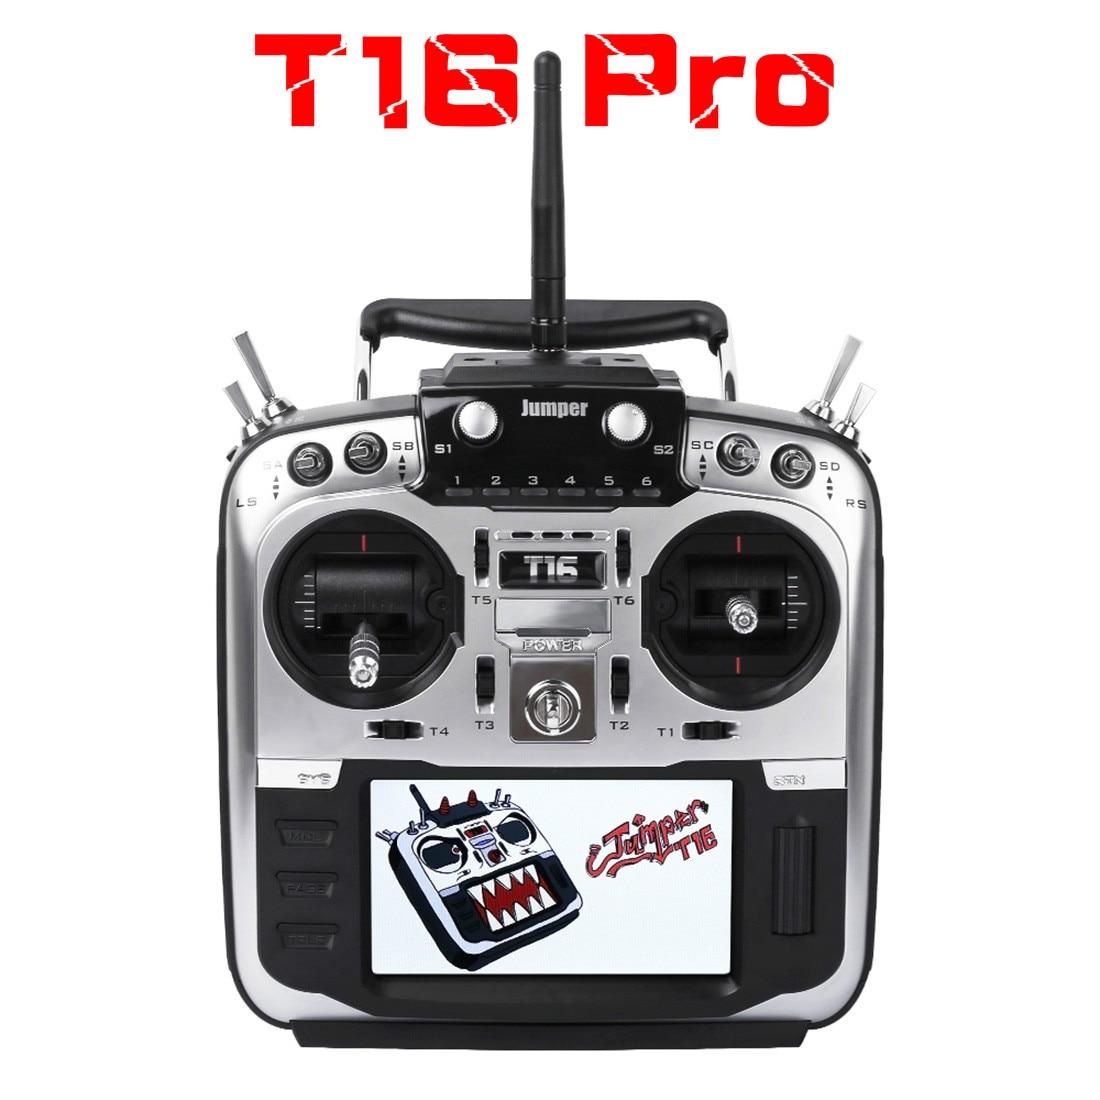 Jumper T16 pro T16 Plus Halle Gimbal Open Source Multi-protokoll Radio Sender JP4-in-1 RF Modul 2,4G 16CH fernbedienung